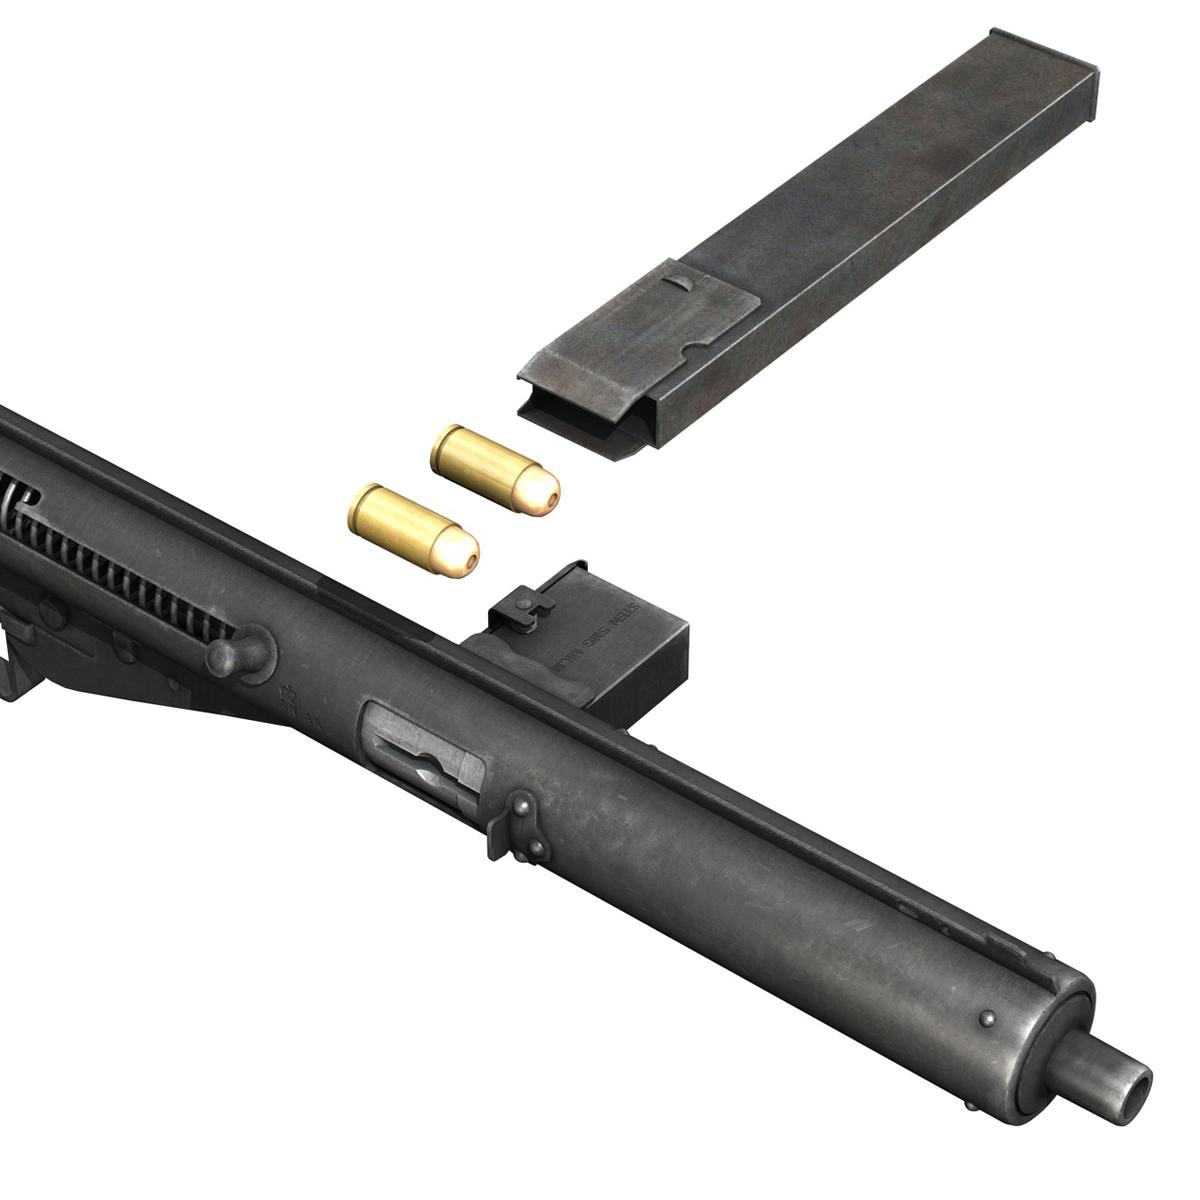 sten mk.iii submachine gun 3d model 3ds fbx c4d lwo obj 195117